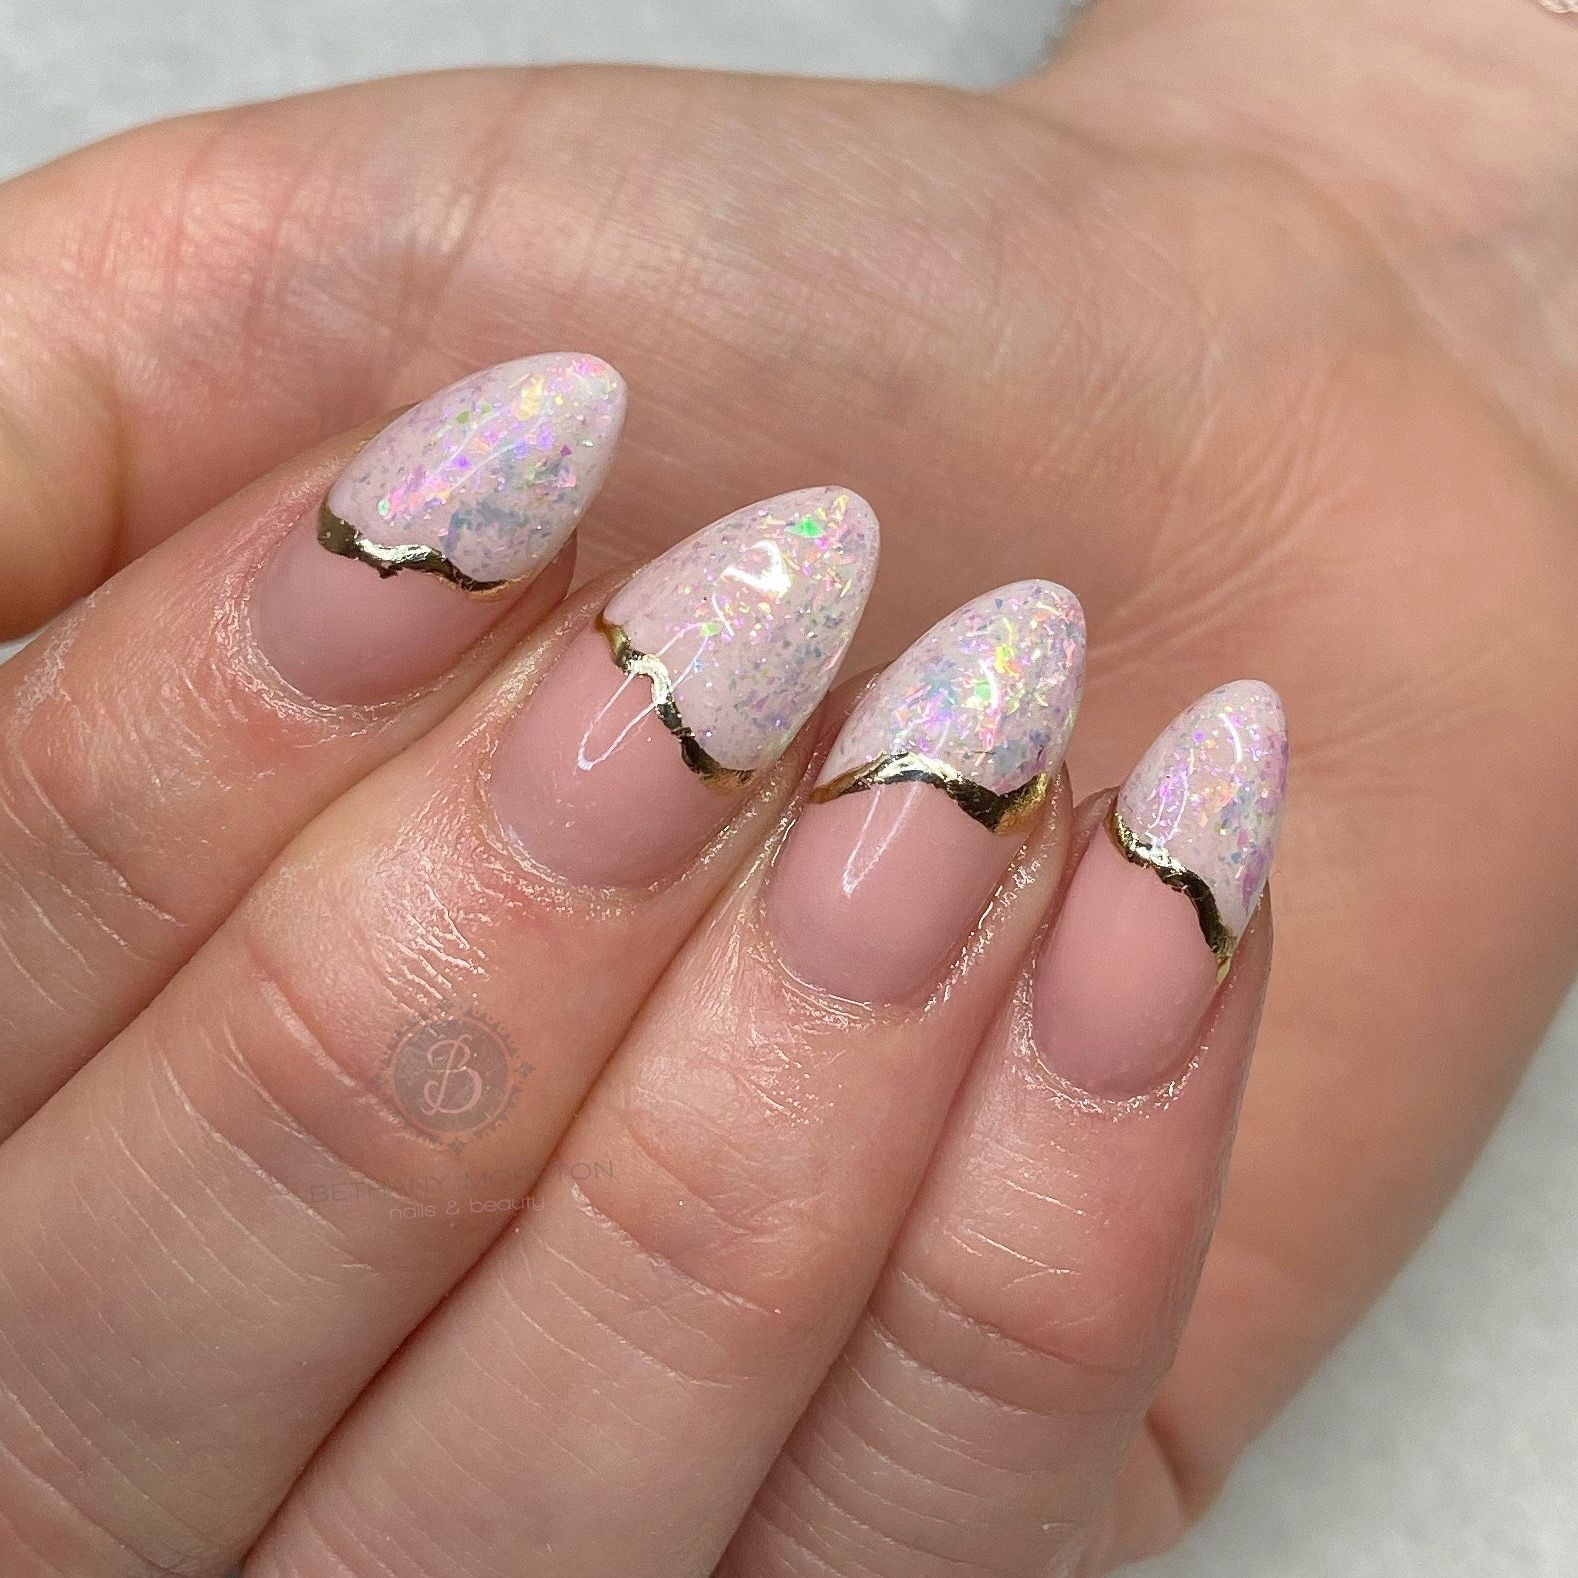 Opalnägel -  Milchrosa Opalnägel     #nails #thegelbottle #biab #nailtech #nailsbybeff   - #opalnagel